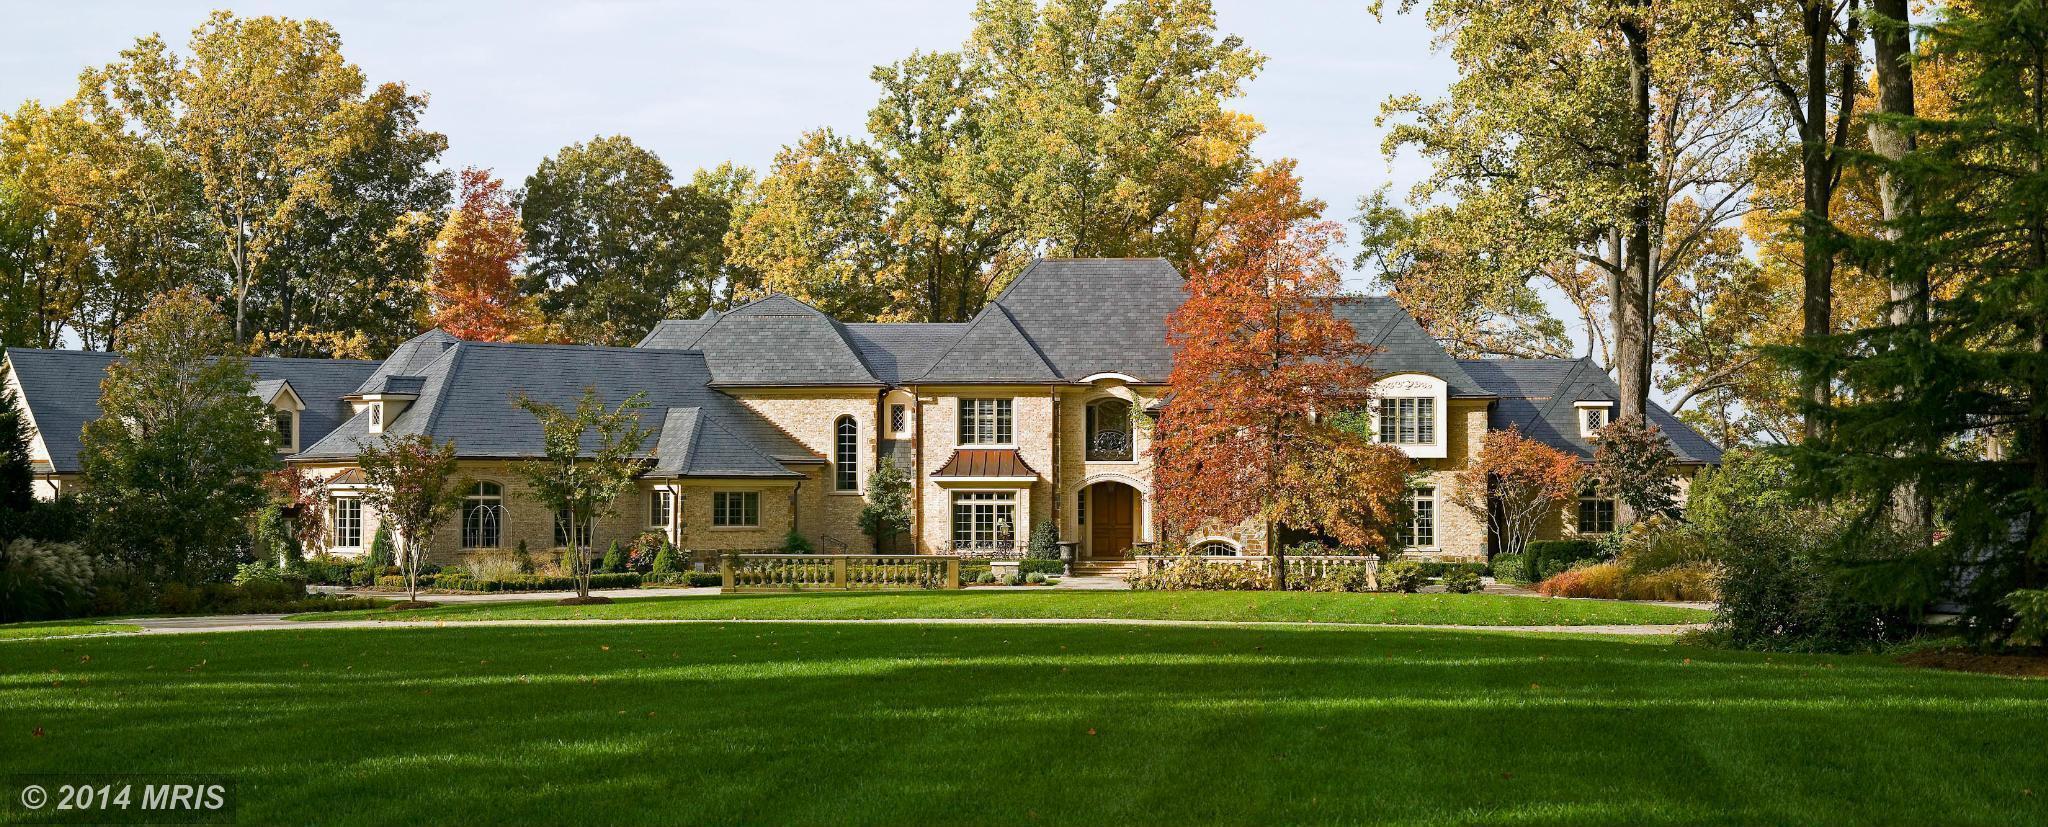 Most expensive homes Baltimore - Baltimore Sun | 2048 x 827 jpeg 513kB